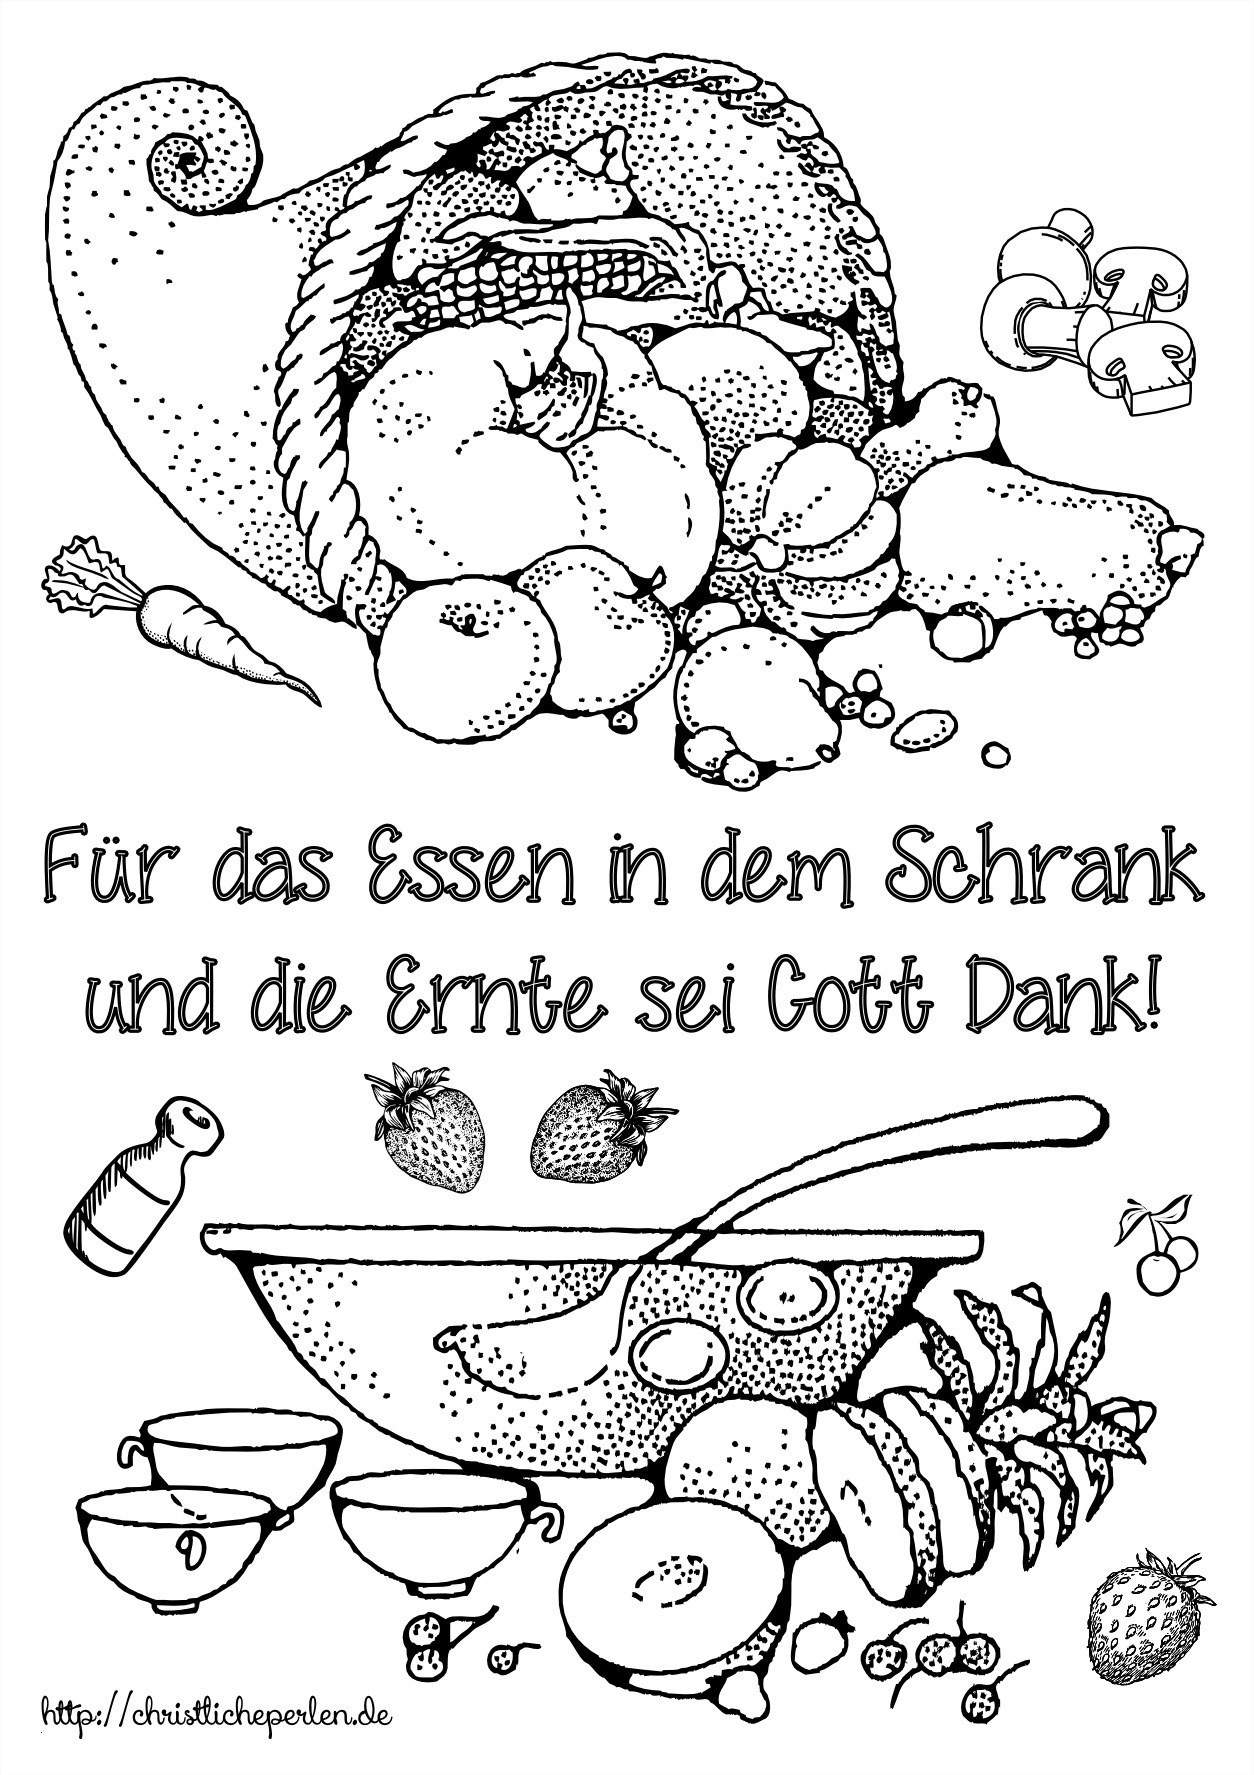 Ausmalbilder Katzen Und Hunde Neu Rosina Wachtmeister Katzen Malvorlagen Elegant Bayern Ausmalbilder Bilder